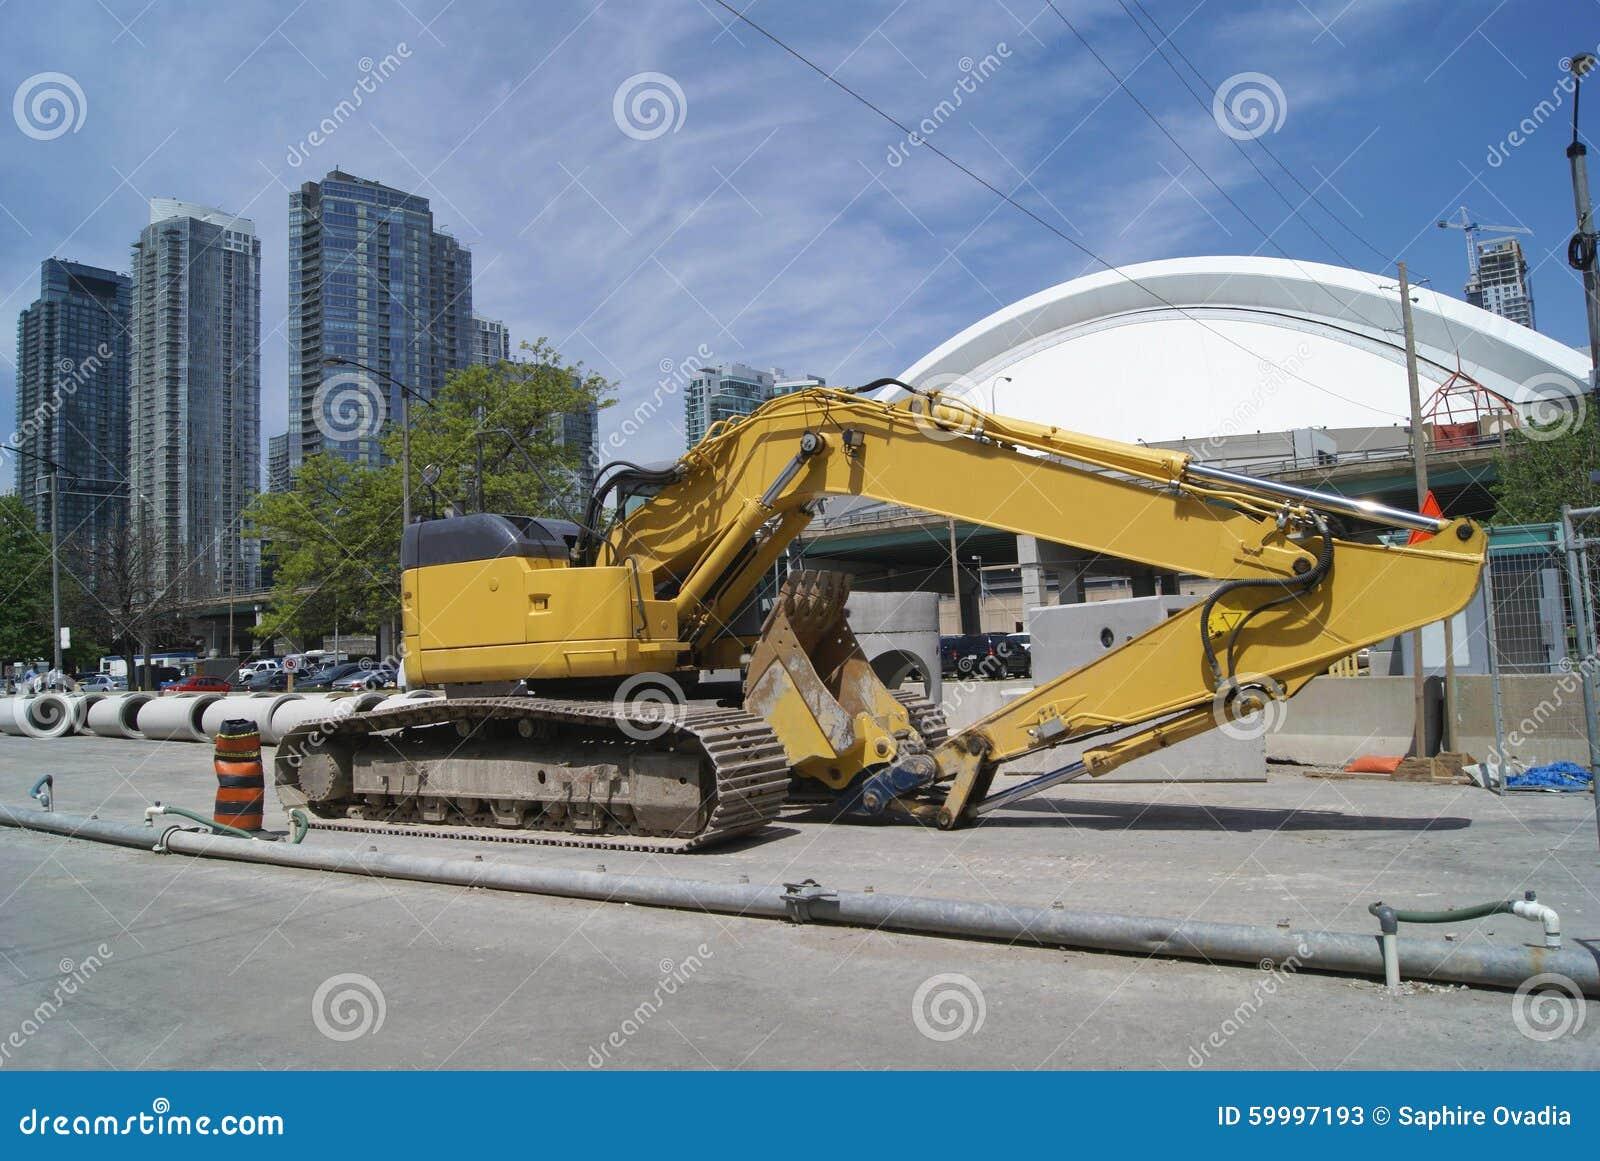 Road work vehicle hydraulic excavator digger